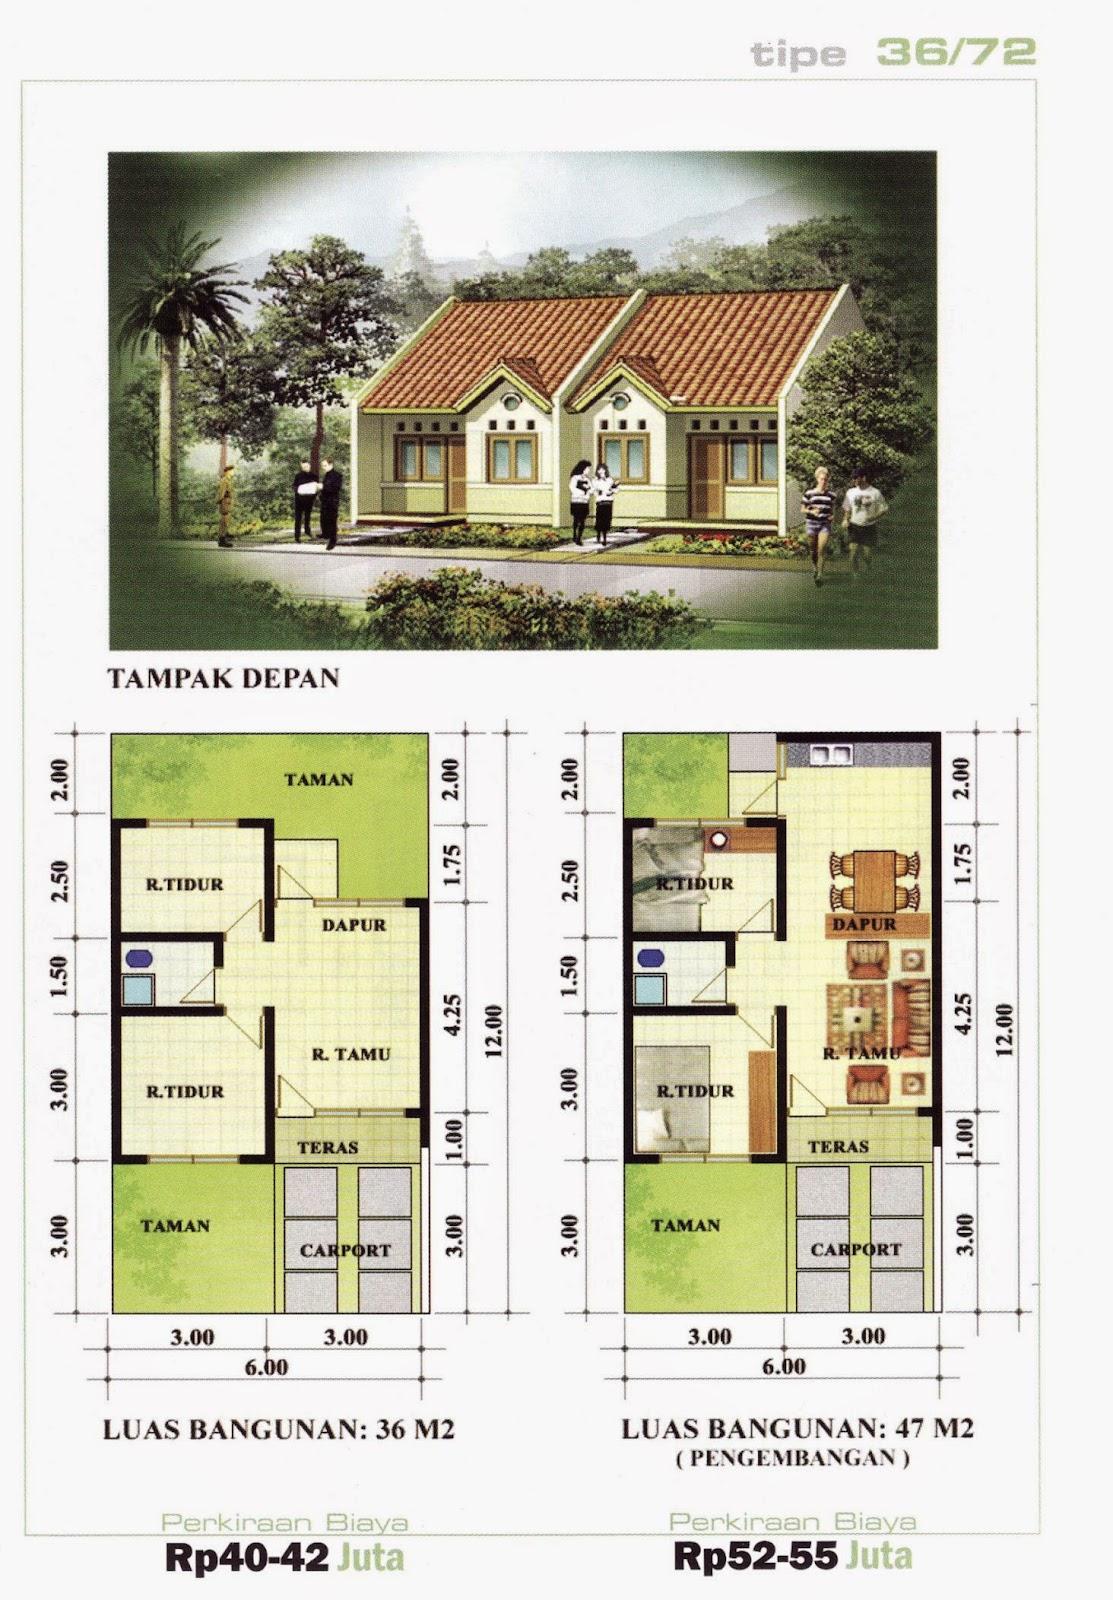 Kumpulan Desain Rumah Minimalis Dan Denah Nya Kumpulan Desain Rumah